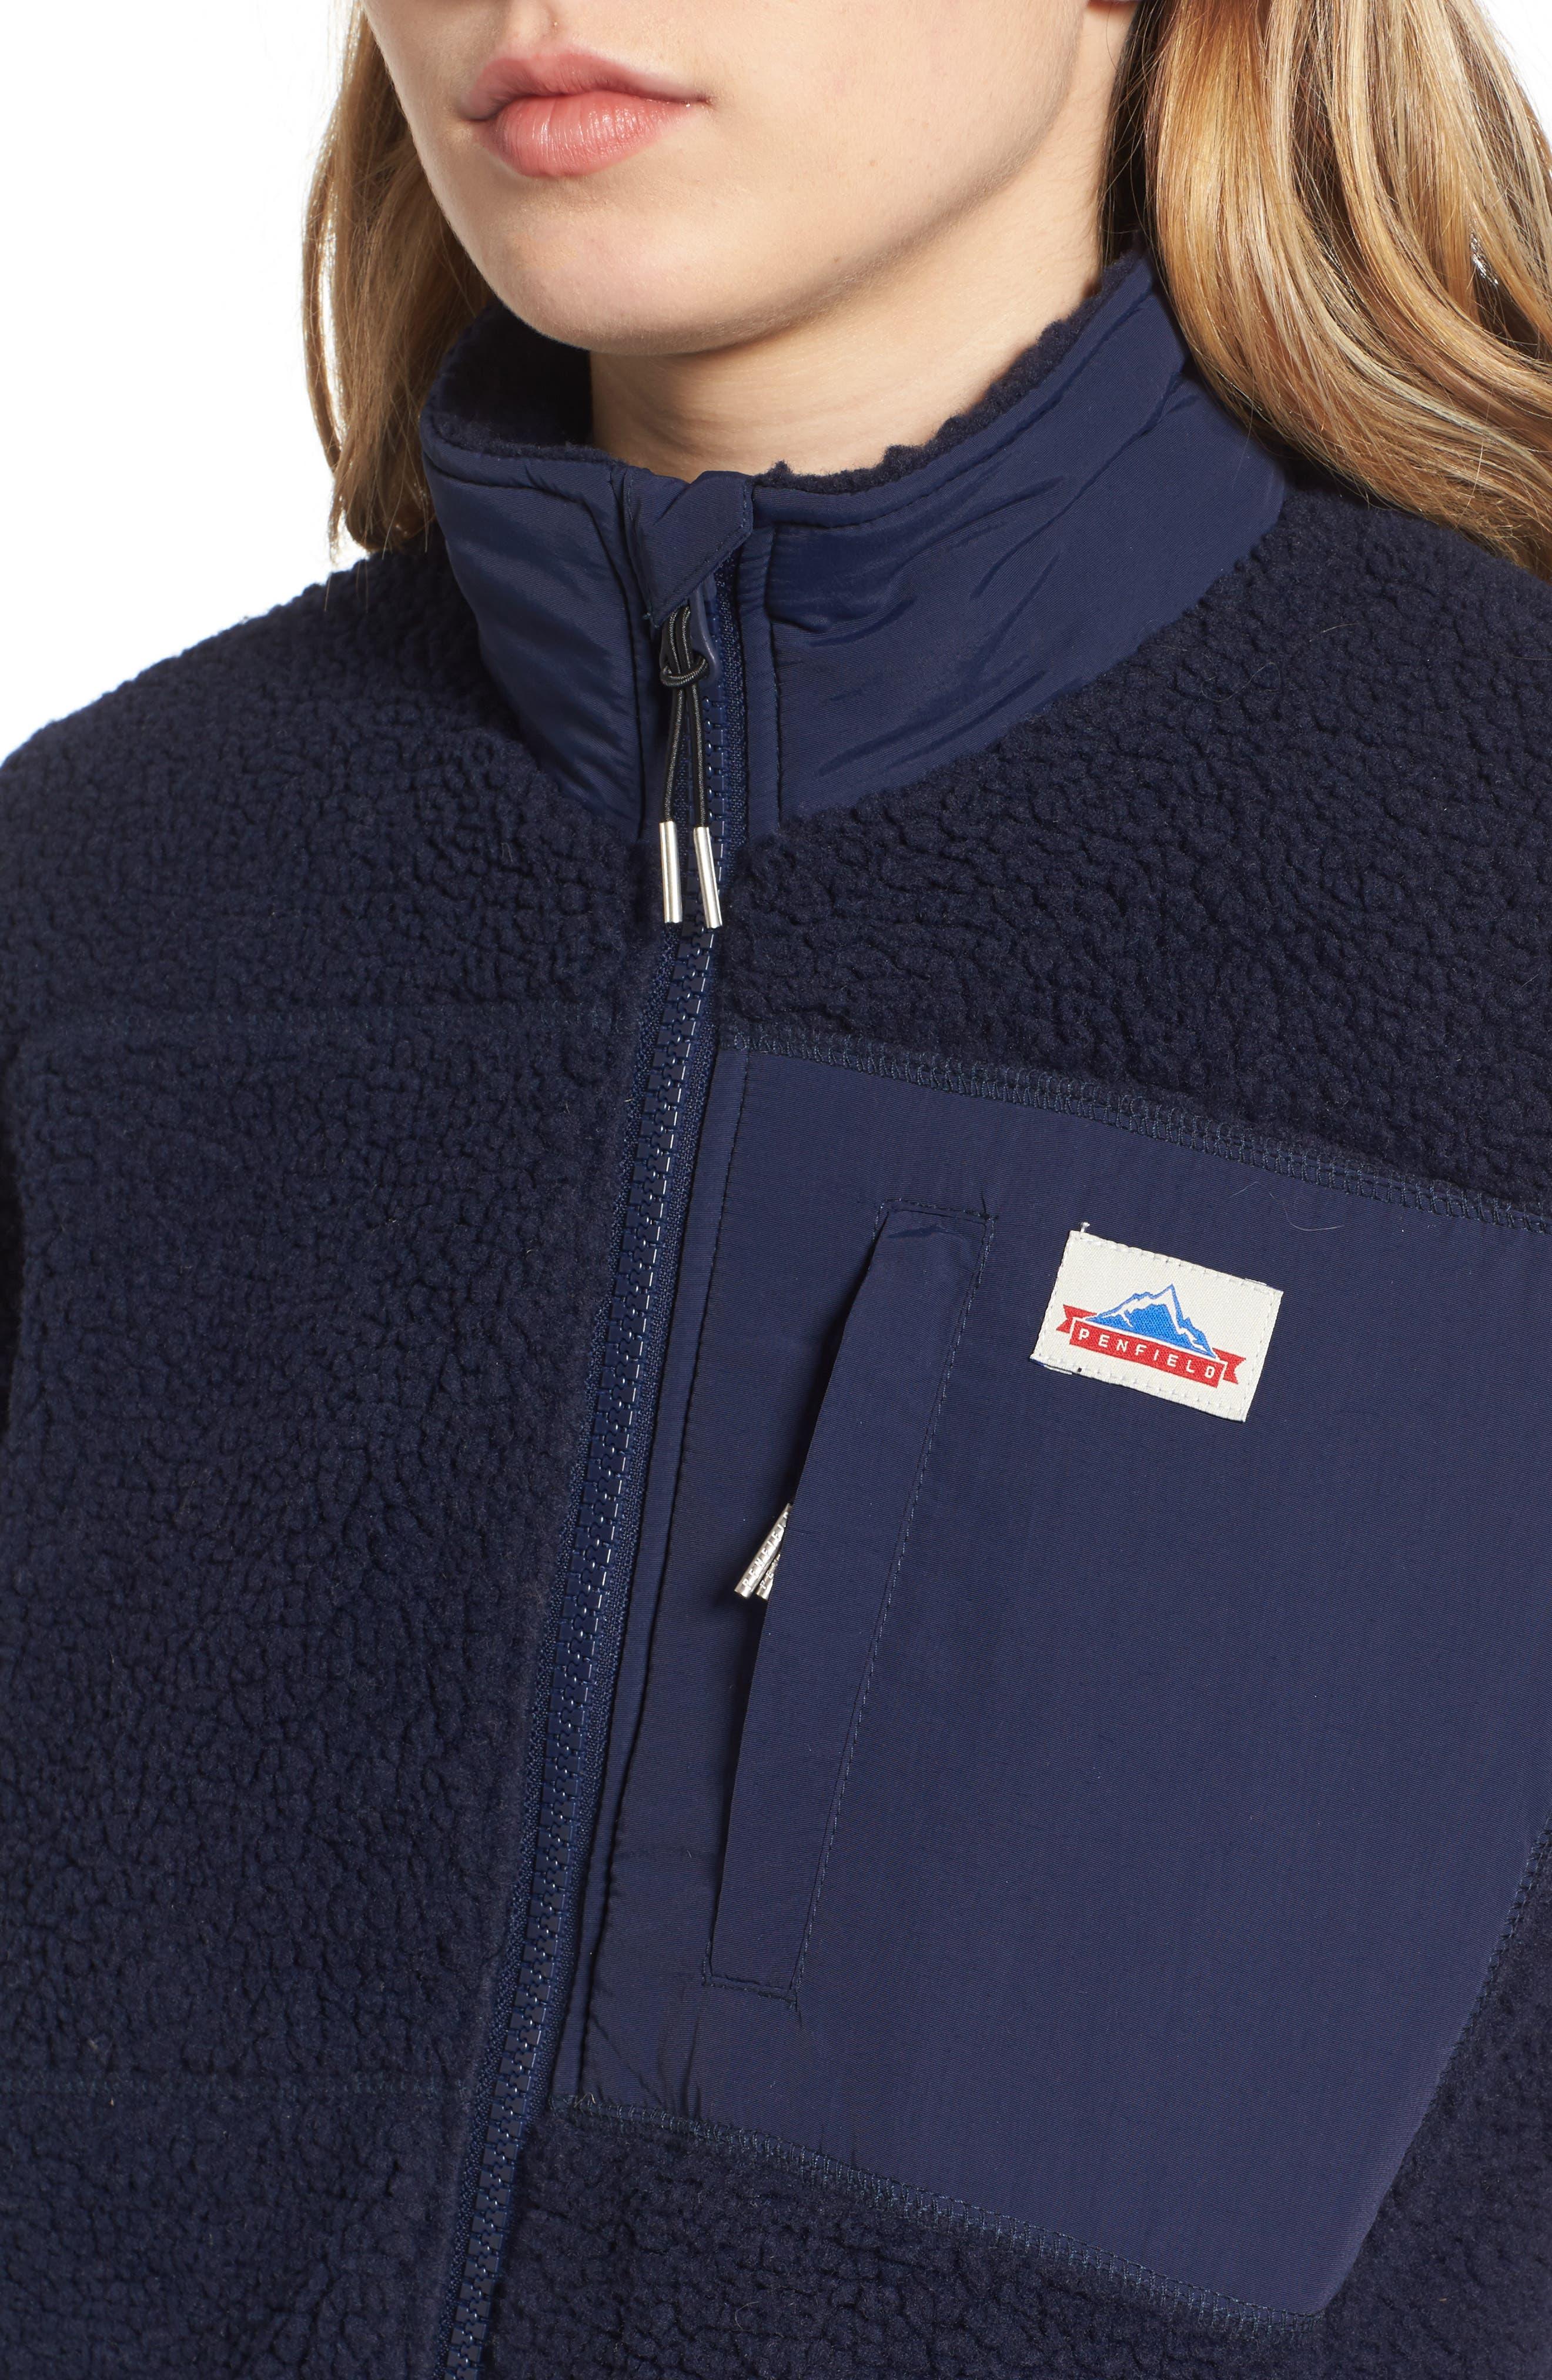 Mattawa Fleece Jacket,                             Alternate thumbnail 4, color,                             Navy